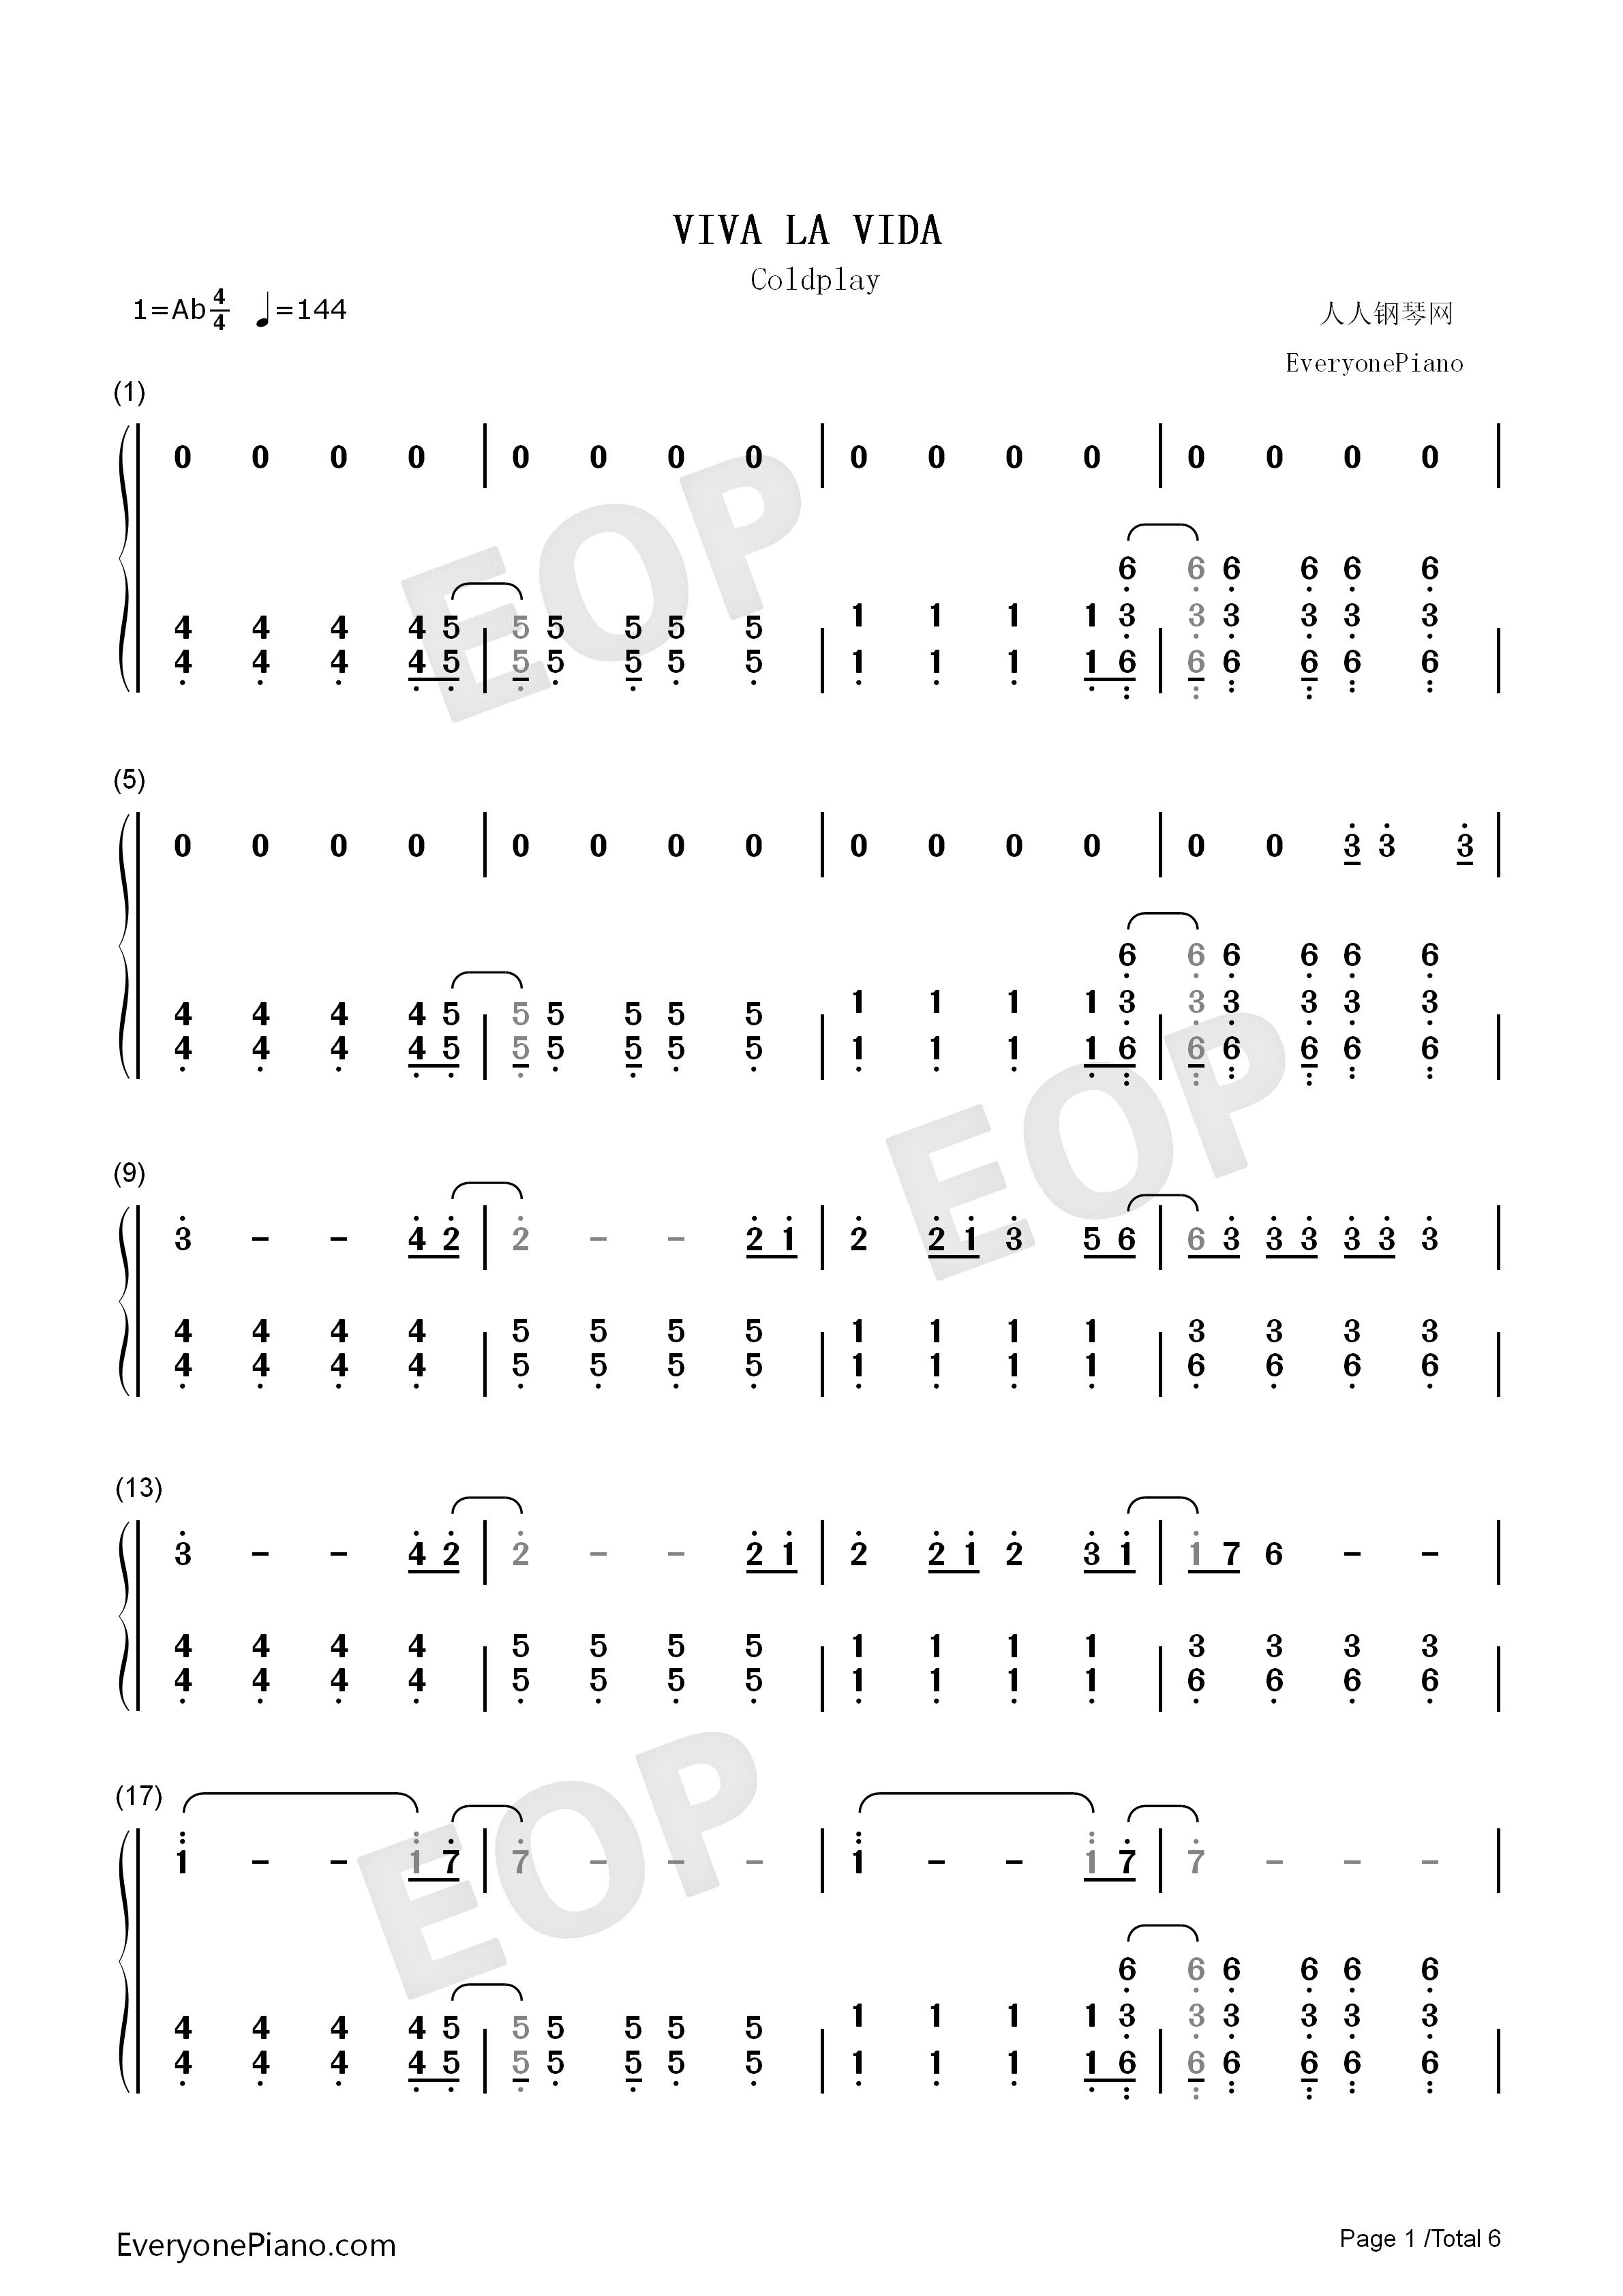 Viva la vida numbered musical notation preview 1 free piano sheet listen now print sheet viva la vida numbered musical notation preview 1 hexwebz Choice Image